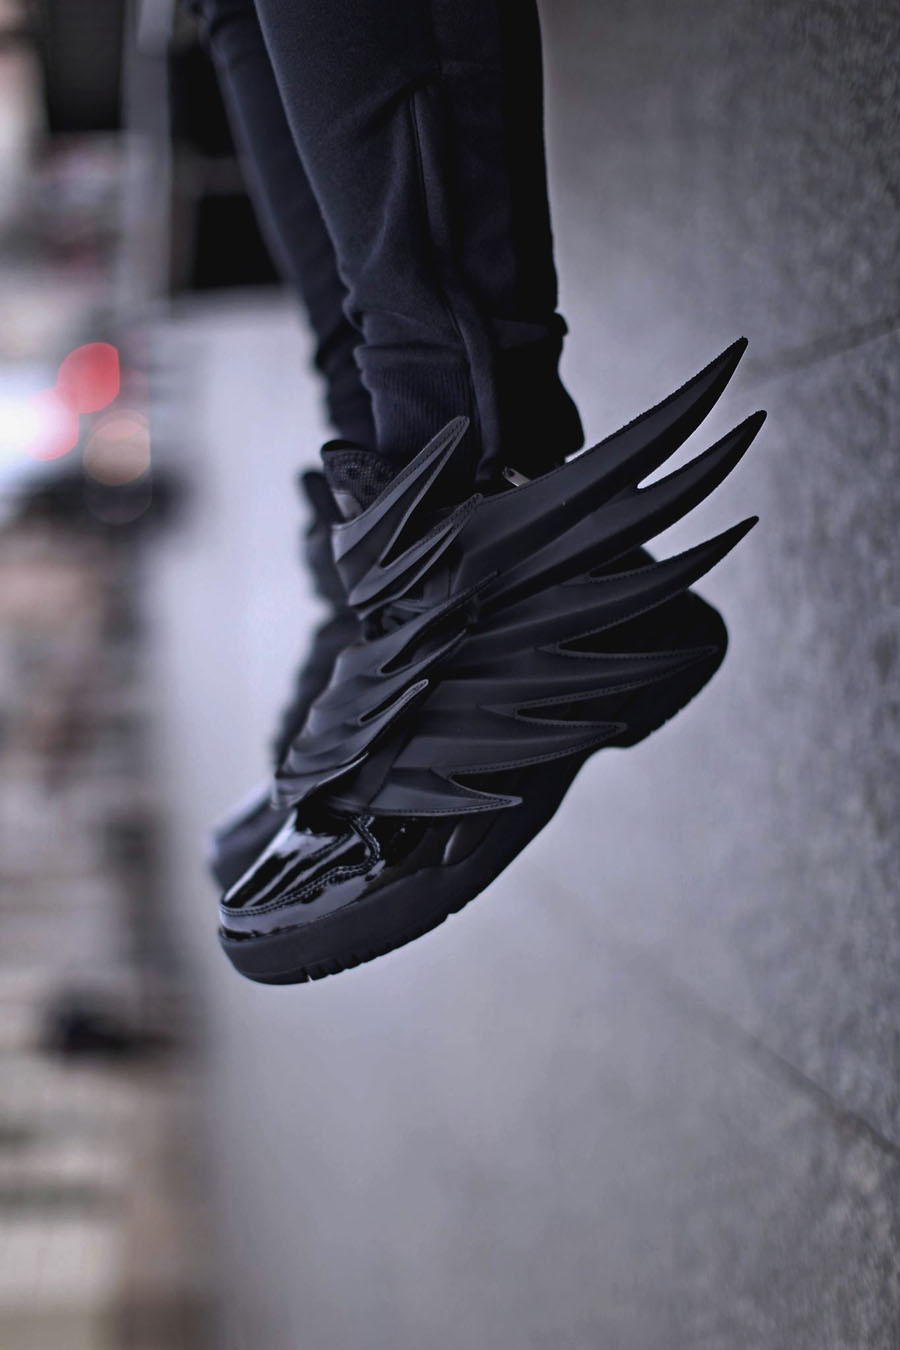 Adidas Js Wings 3.0 Dark Knight